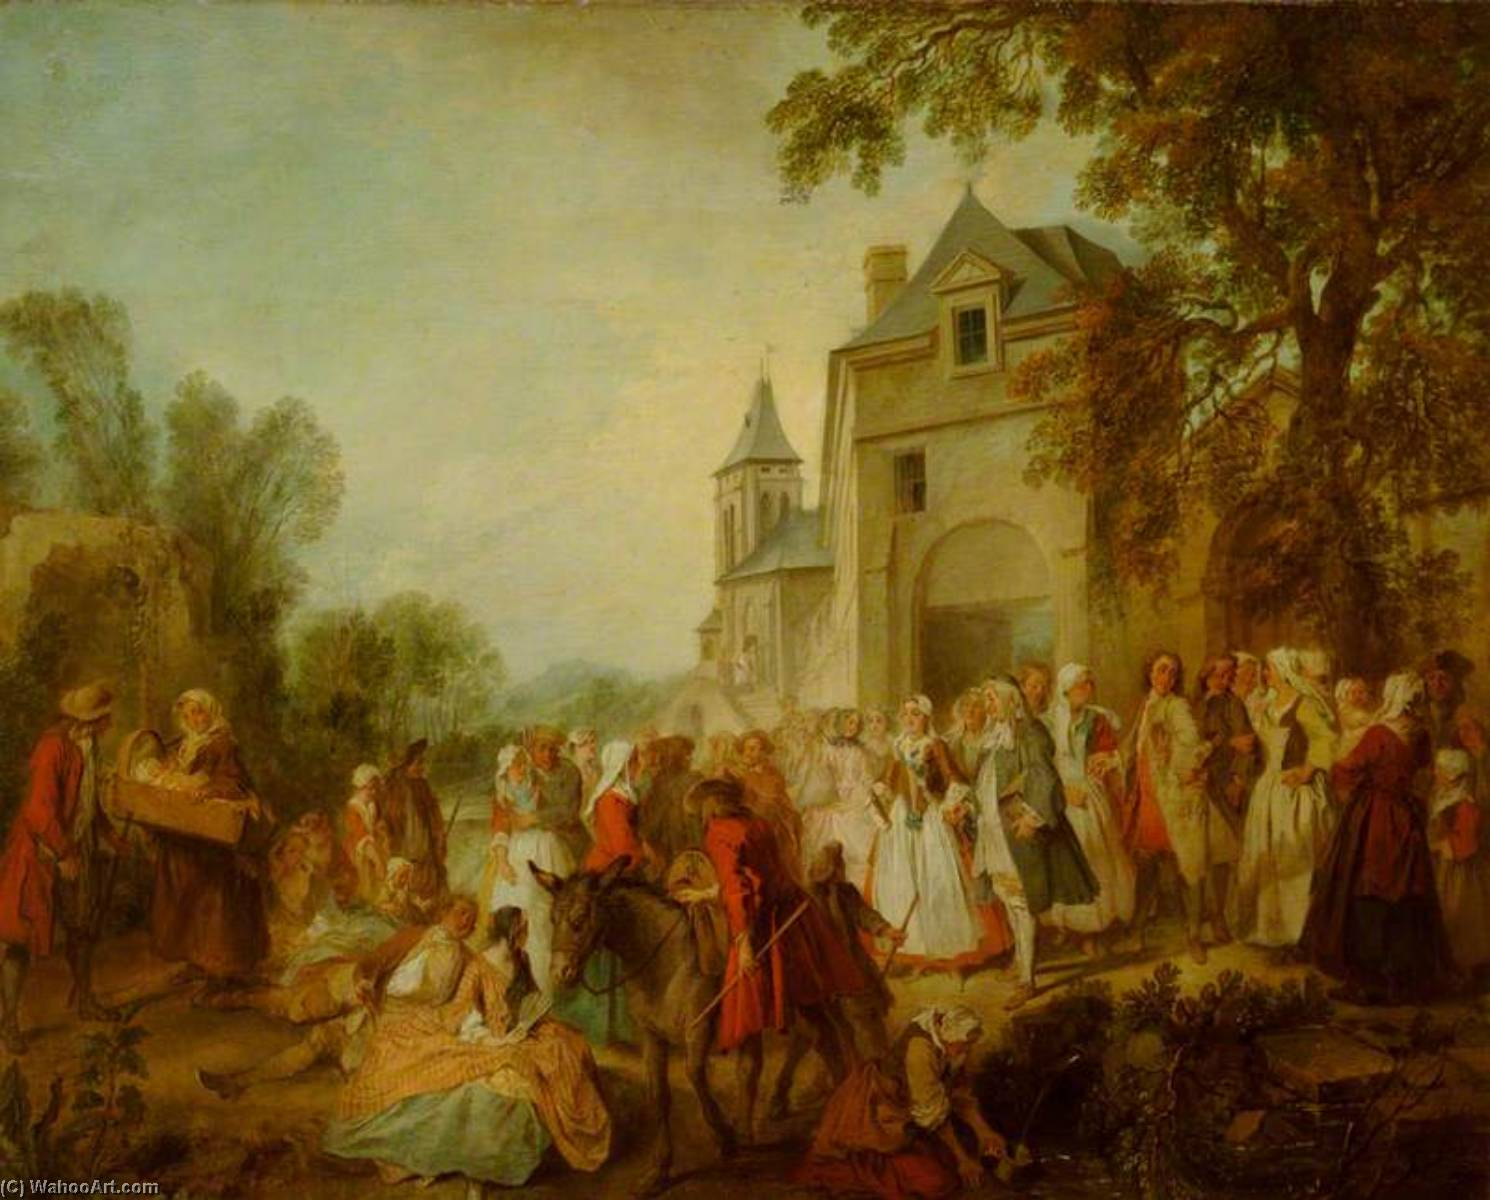 Lancret 1737-40 Le mariage au village Waddesdon Manor